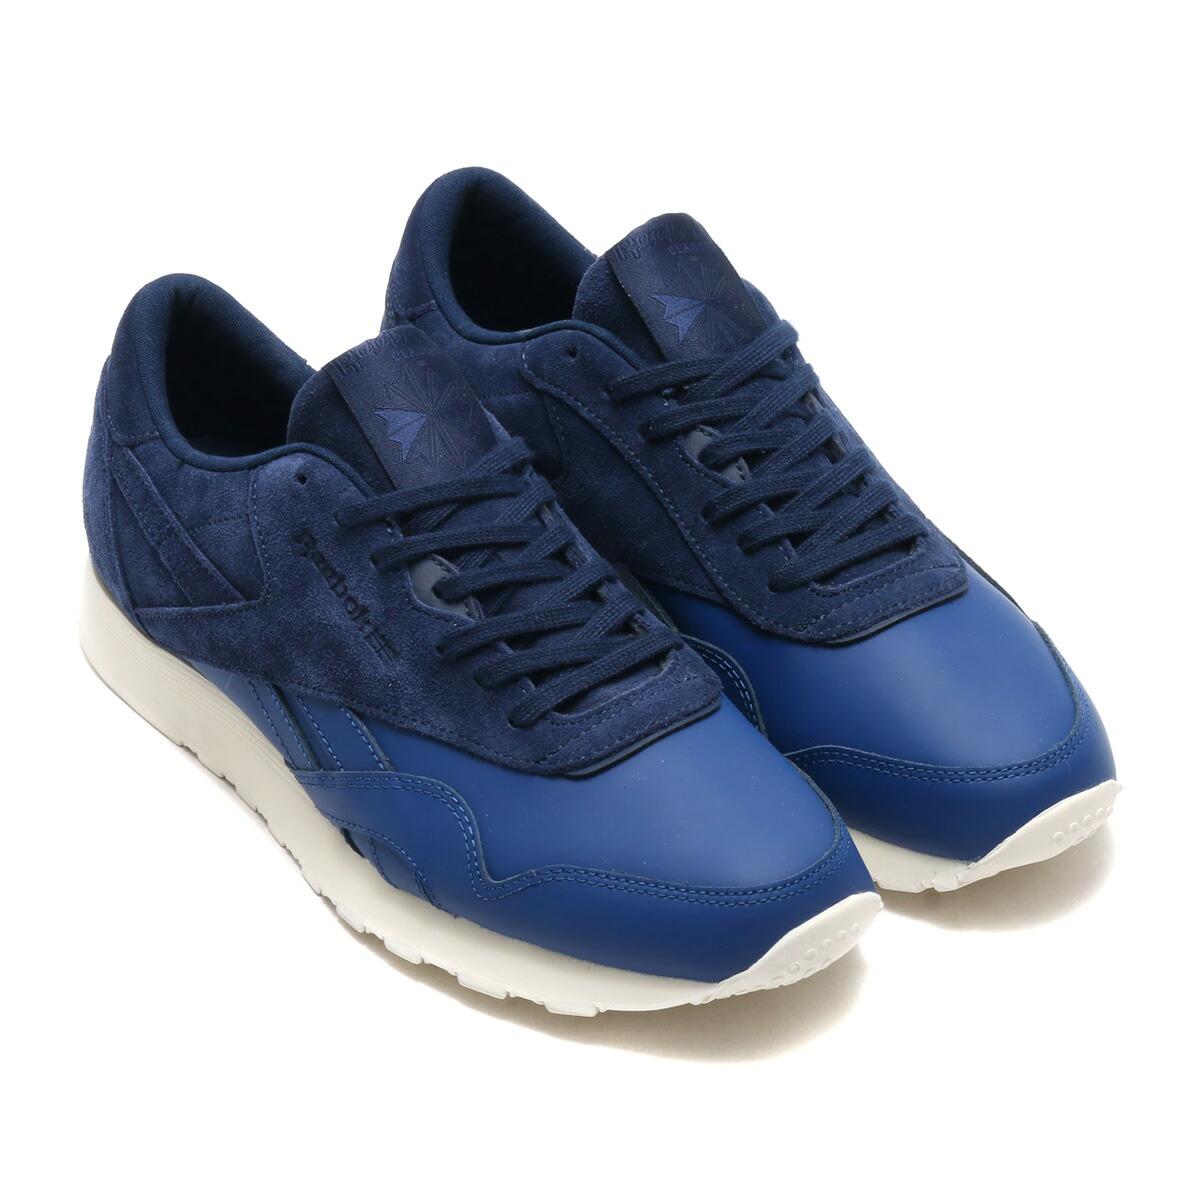 a14ce7cf2b0 Reebok CLASSIC (Reebok classical music) sneakers.